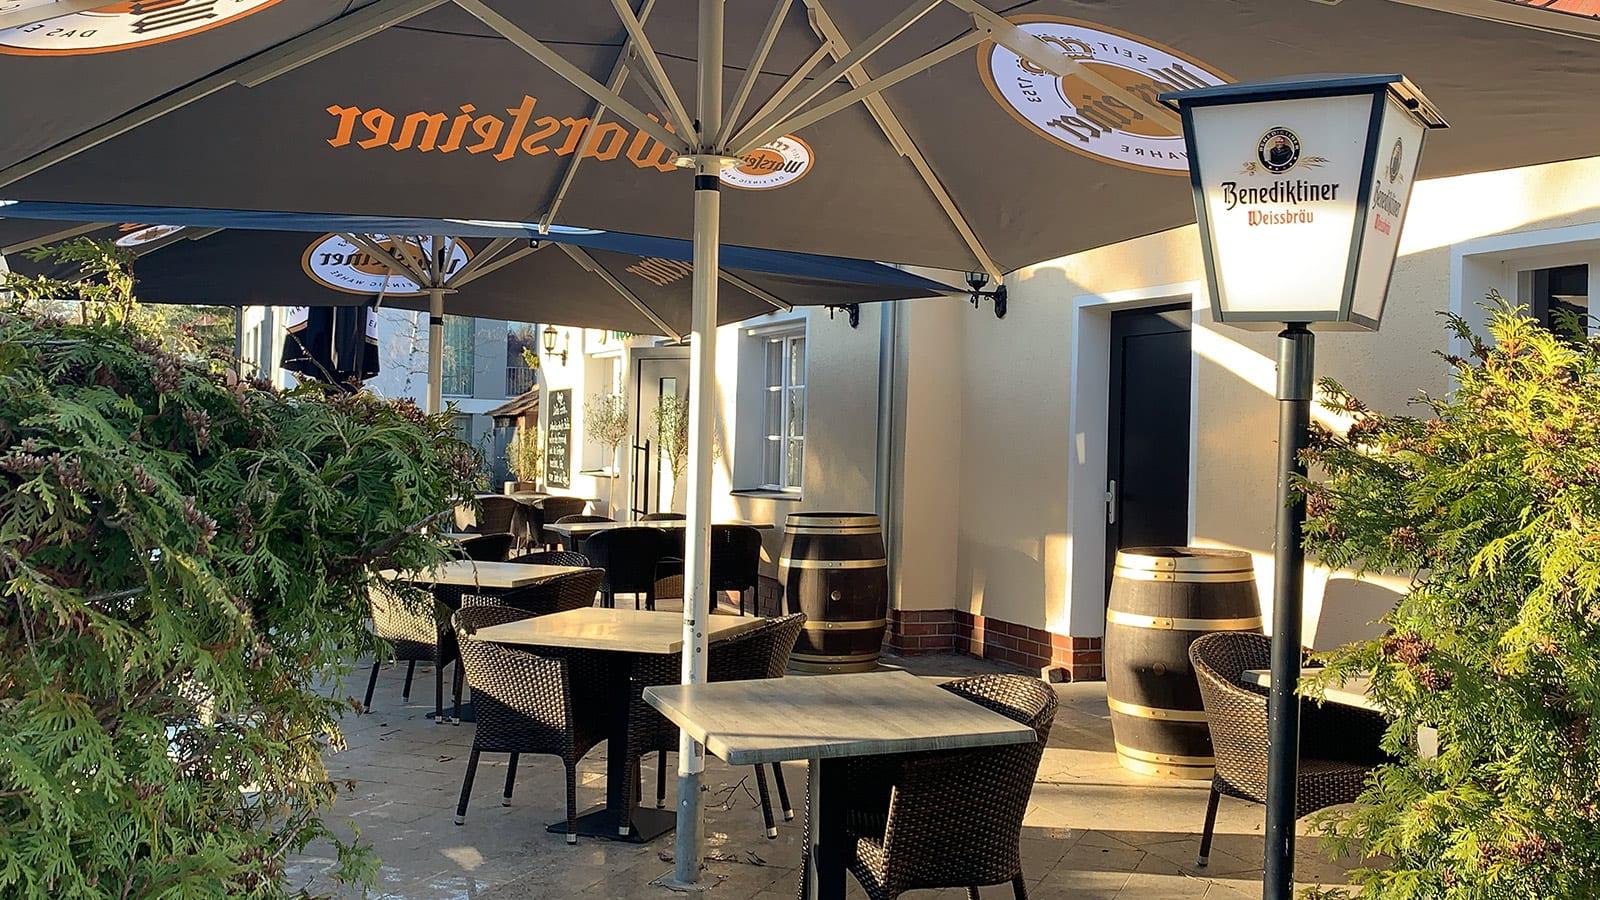 Jägers Restaurant